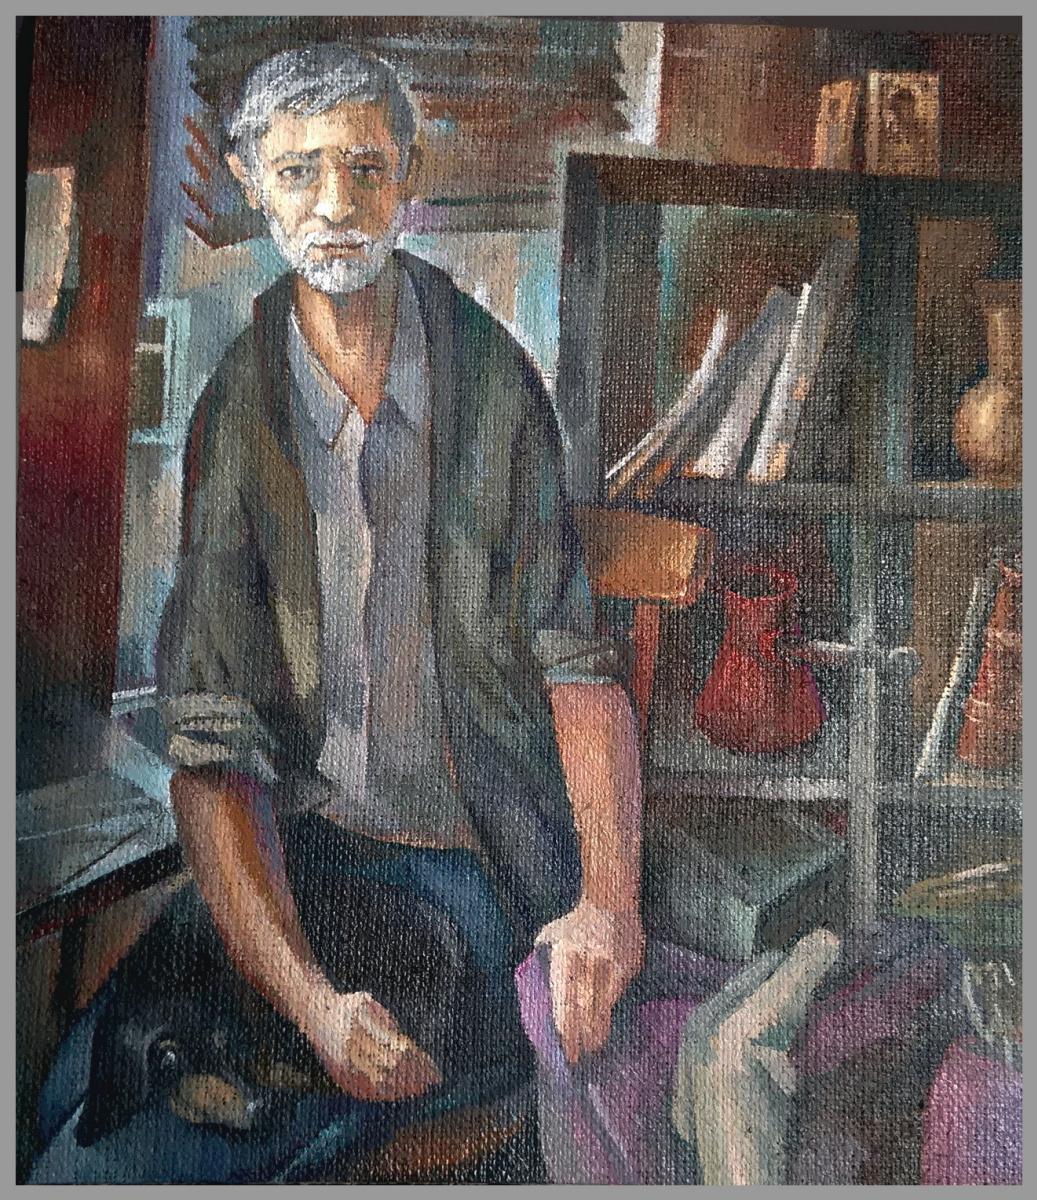 Sergei Yurievich Smilga. Self-portrait with a dog